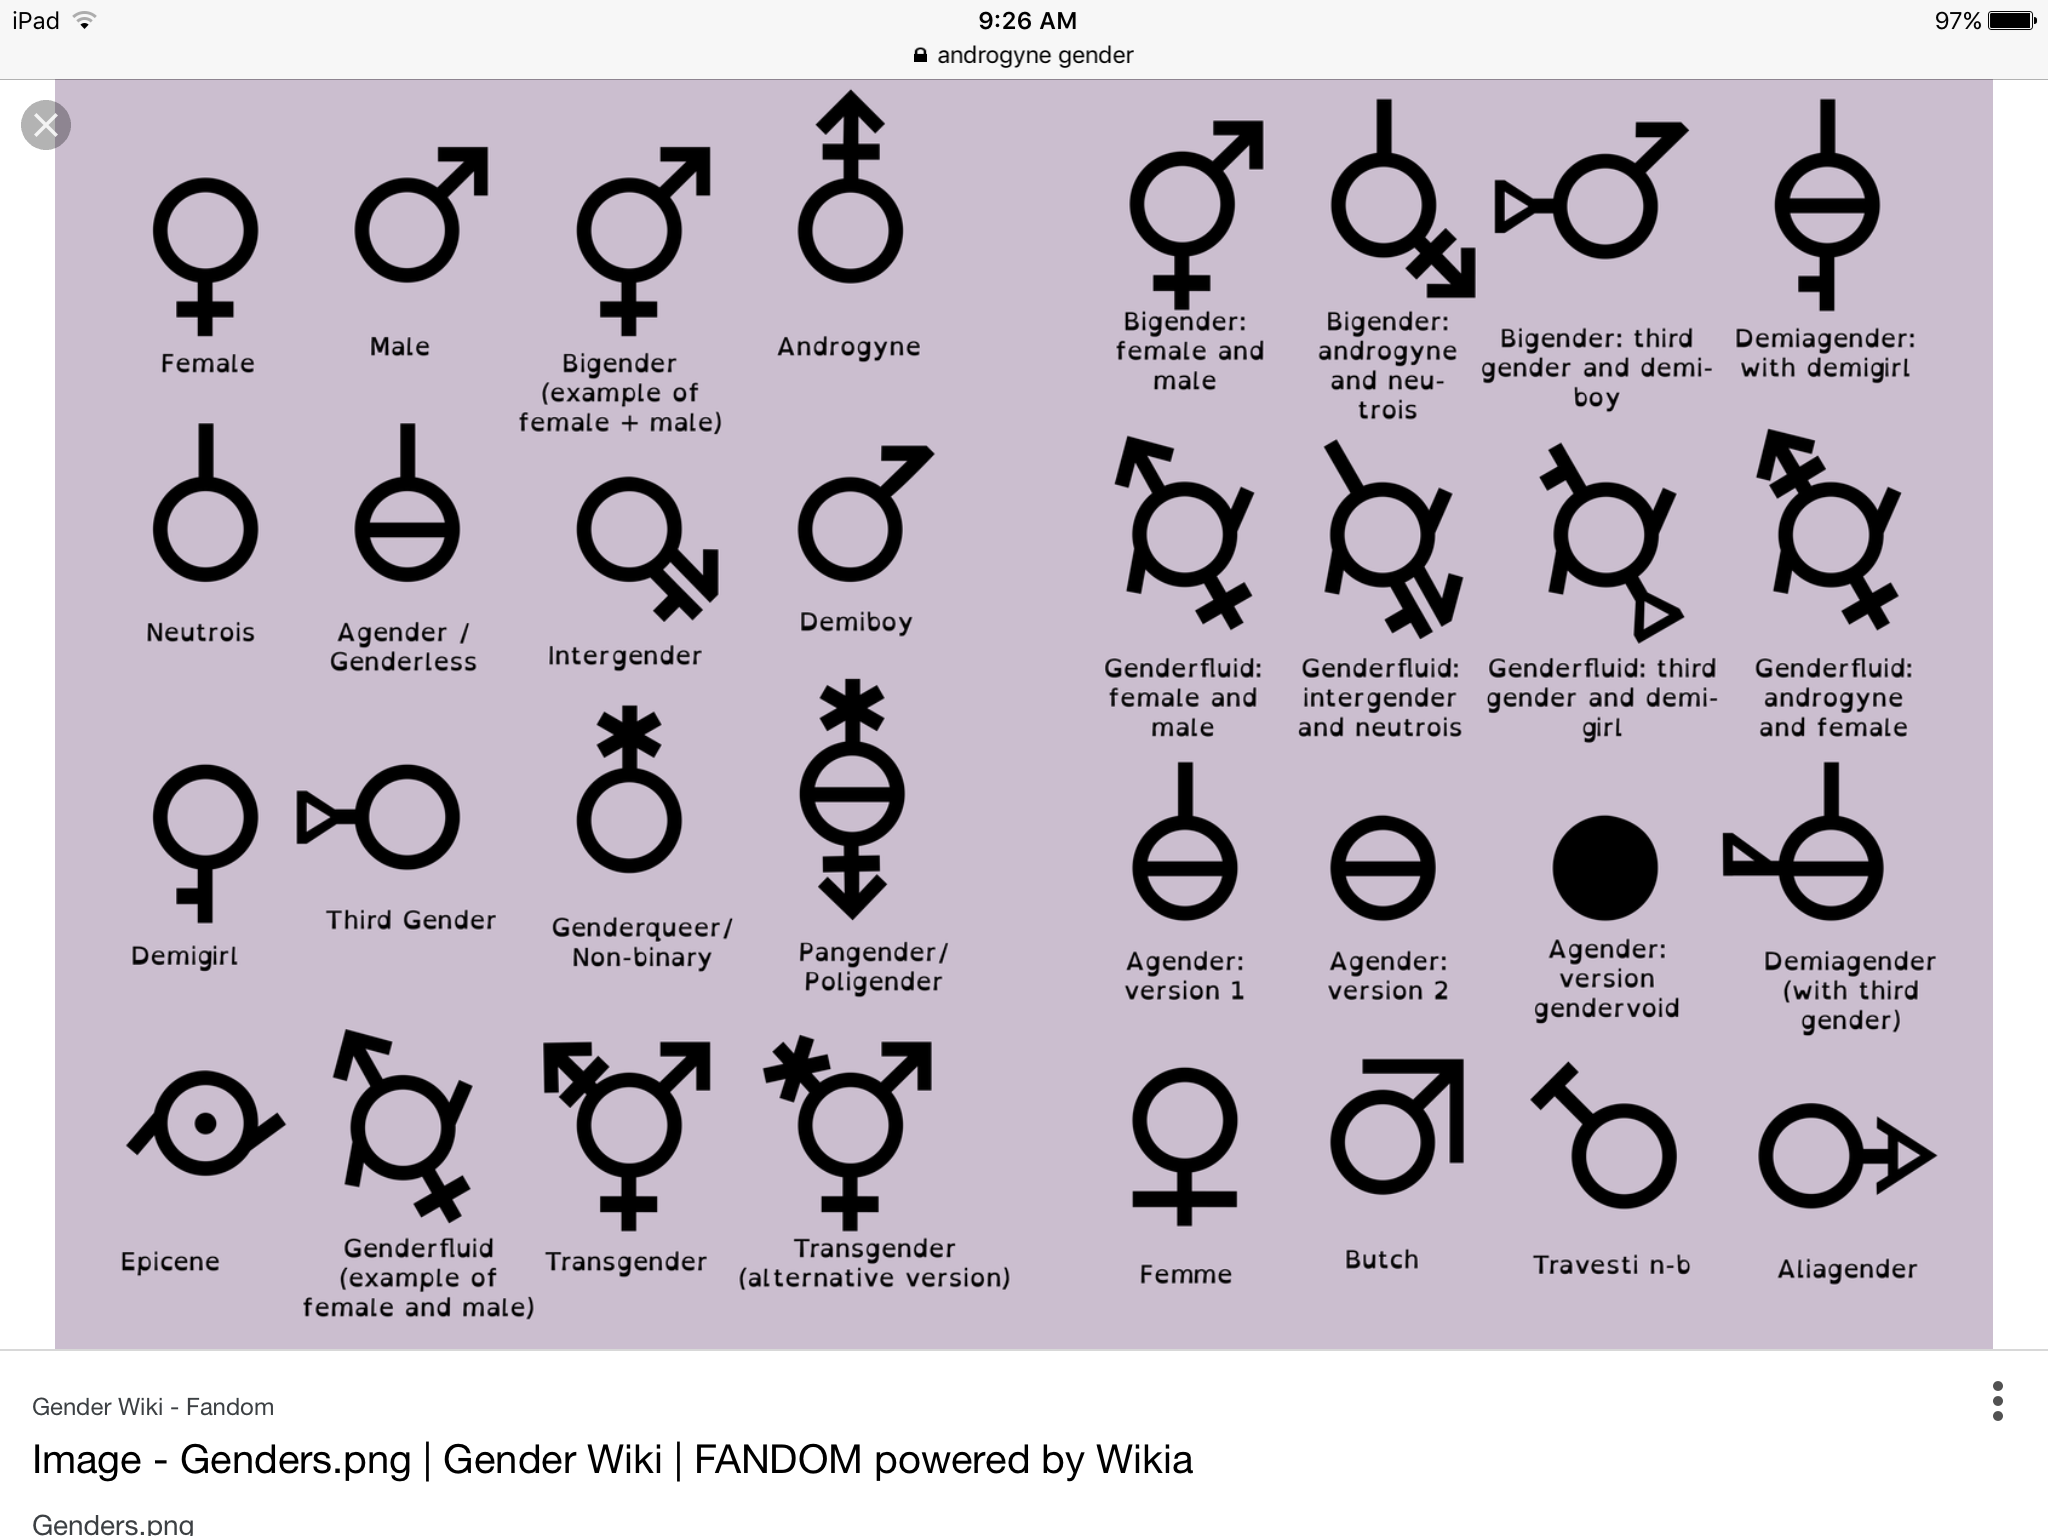 Pin by pintrash on lgbtq pride pinterest lgbt attack helicopter chart google search searching symbols lgbt saga gender pride buycottarizona Choice Image